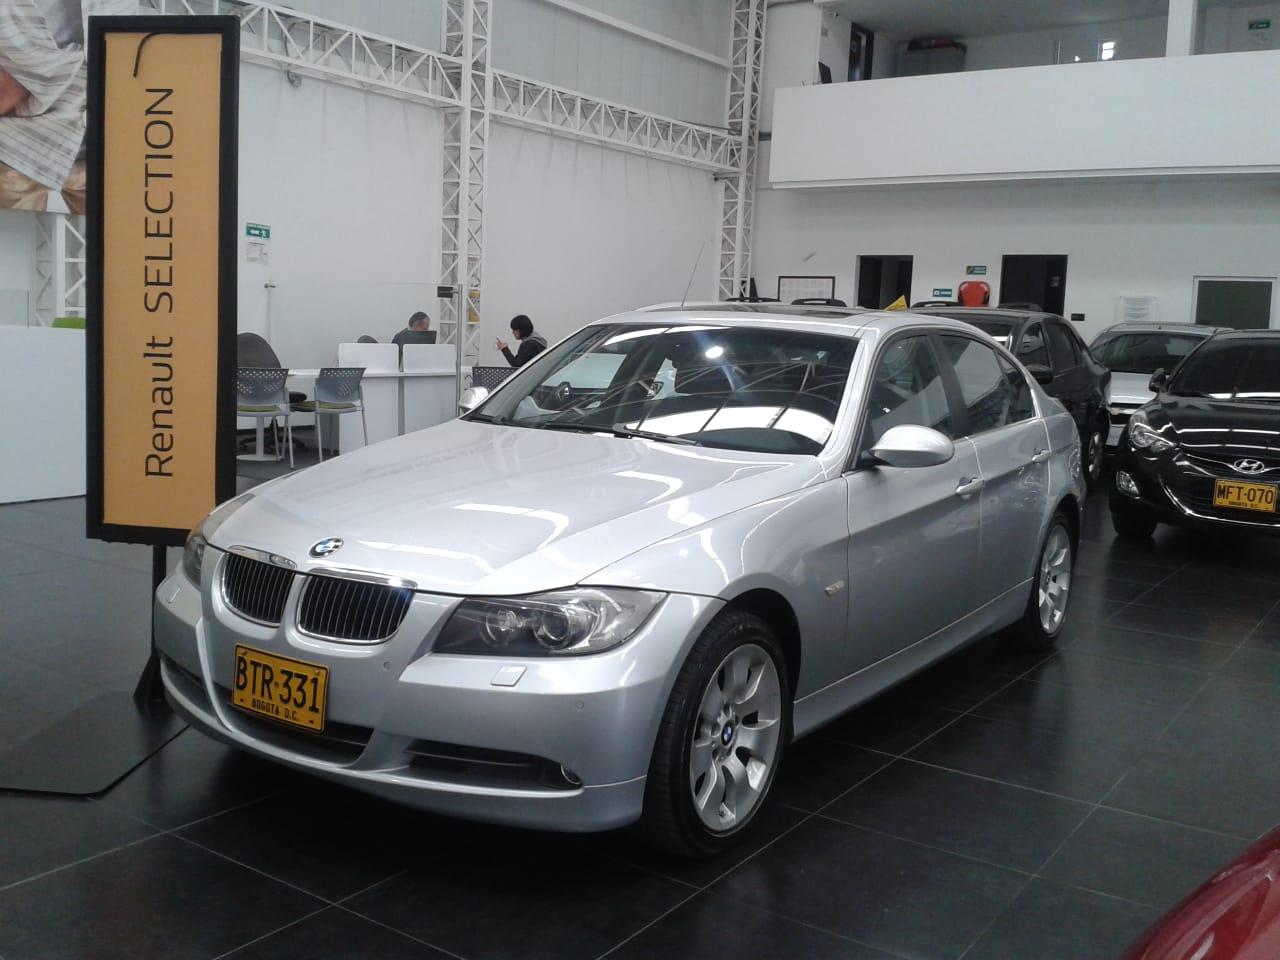 BMW 330I   BRT331